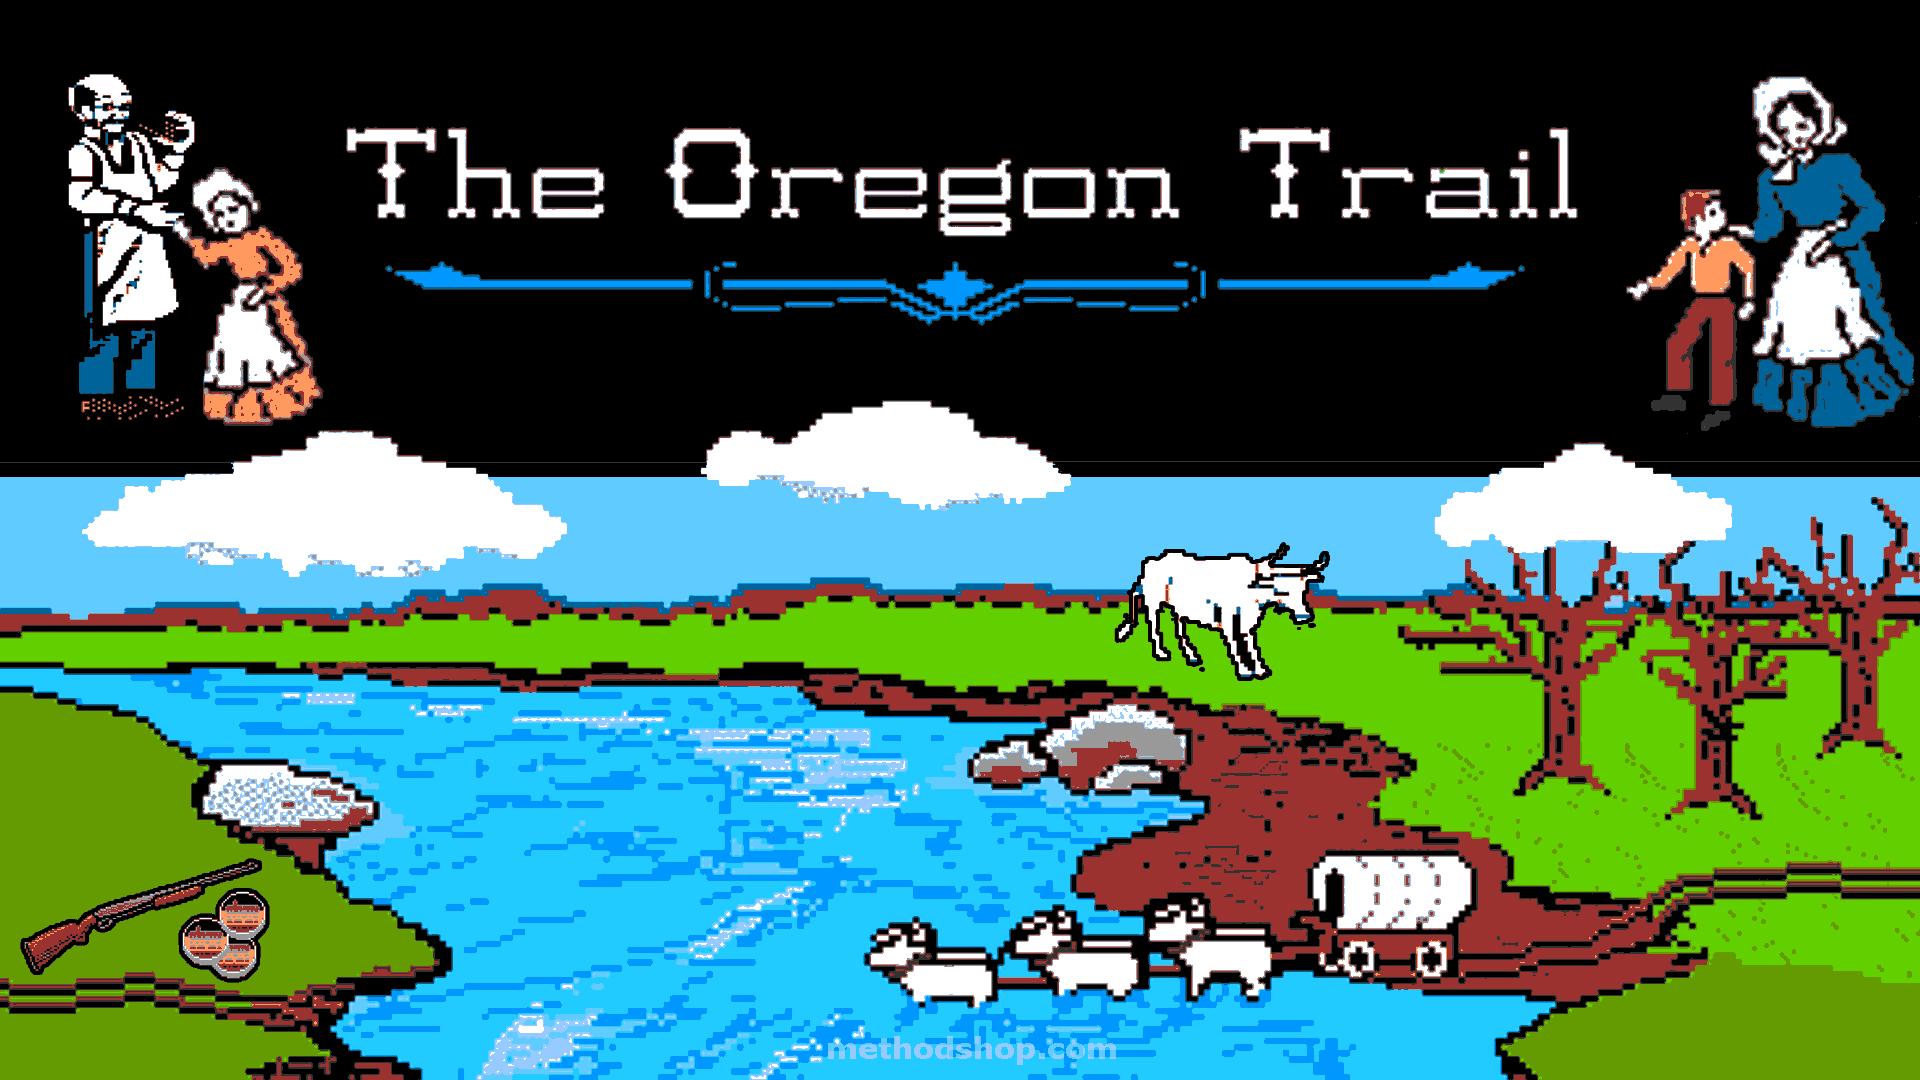 The Original Oregon Trail Game